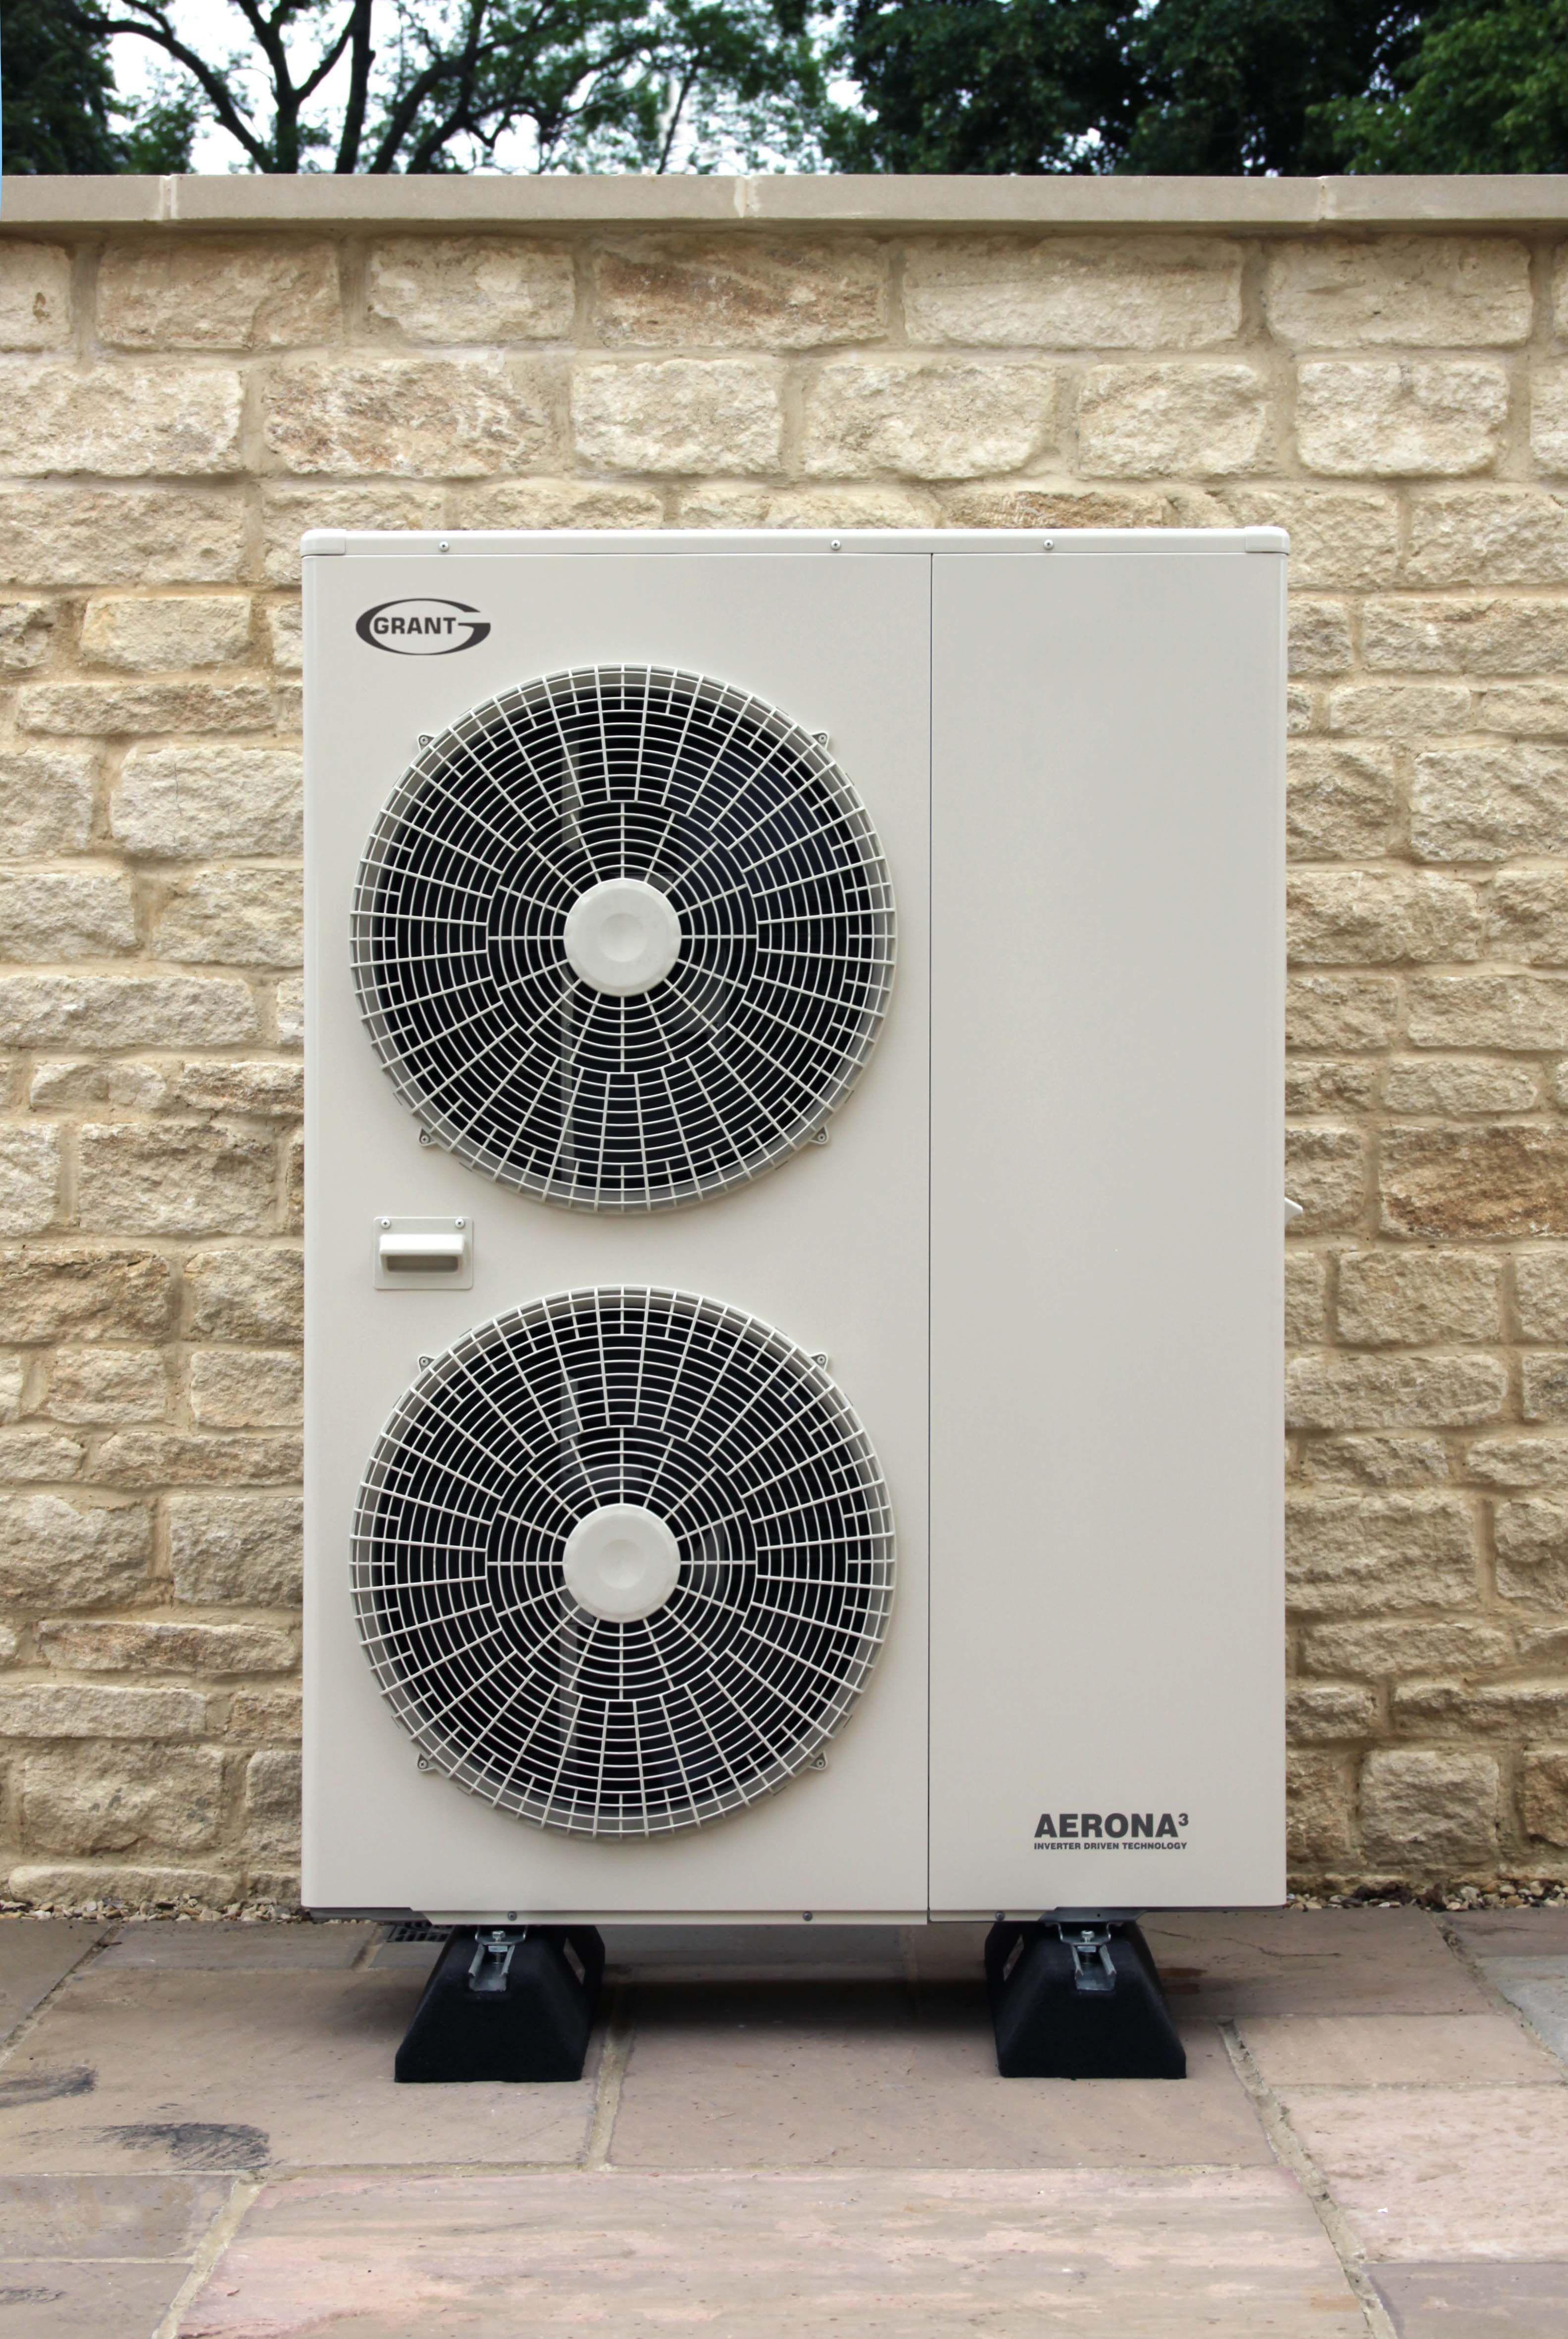 Grant Aerona3 16kw Air Source Heat Pump Renewables